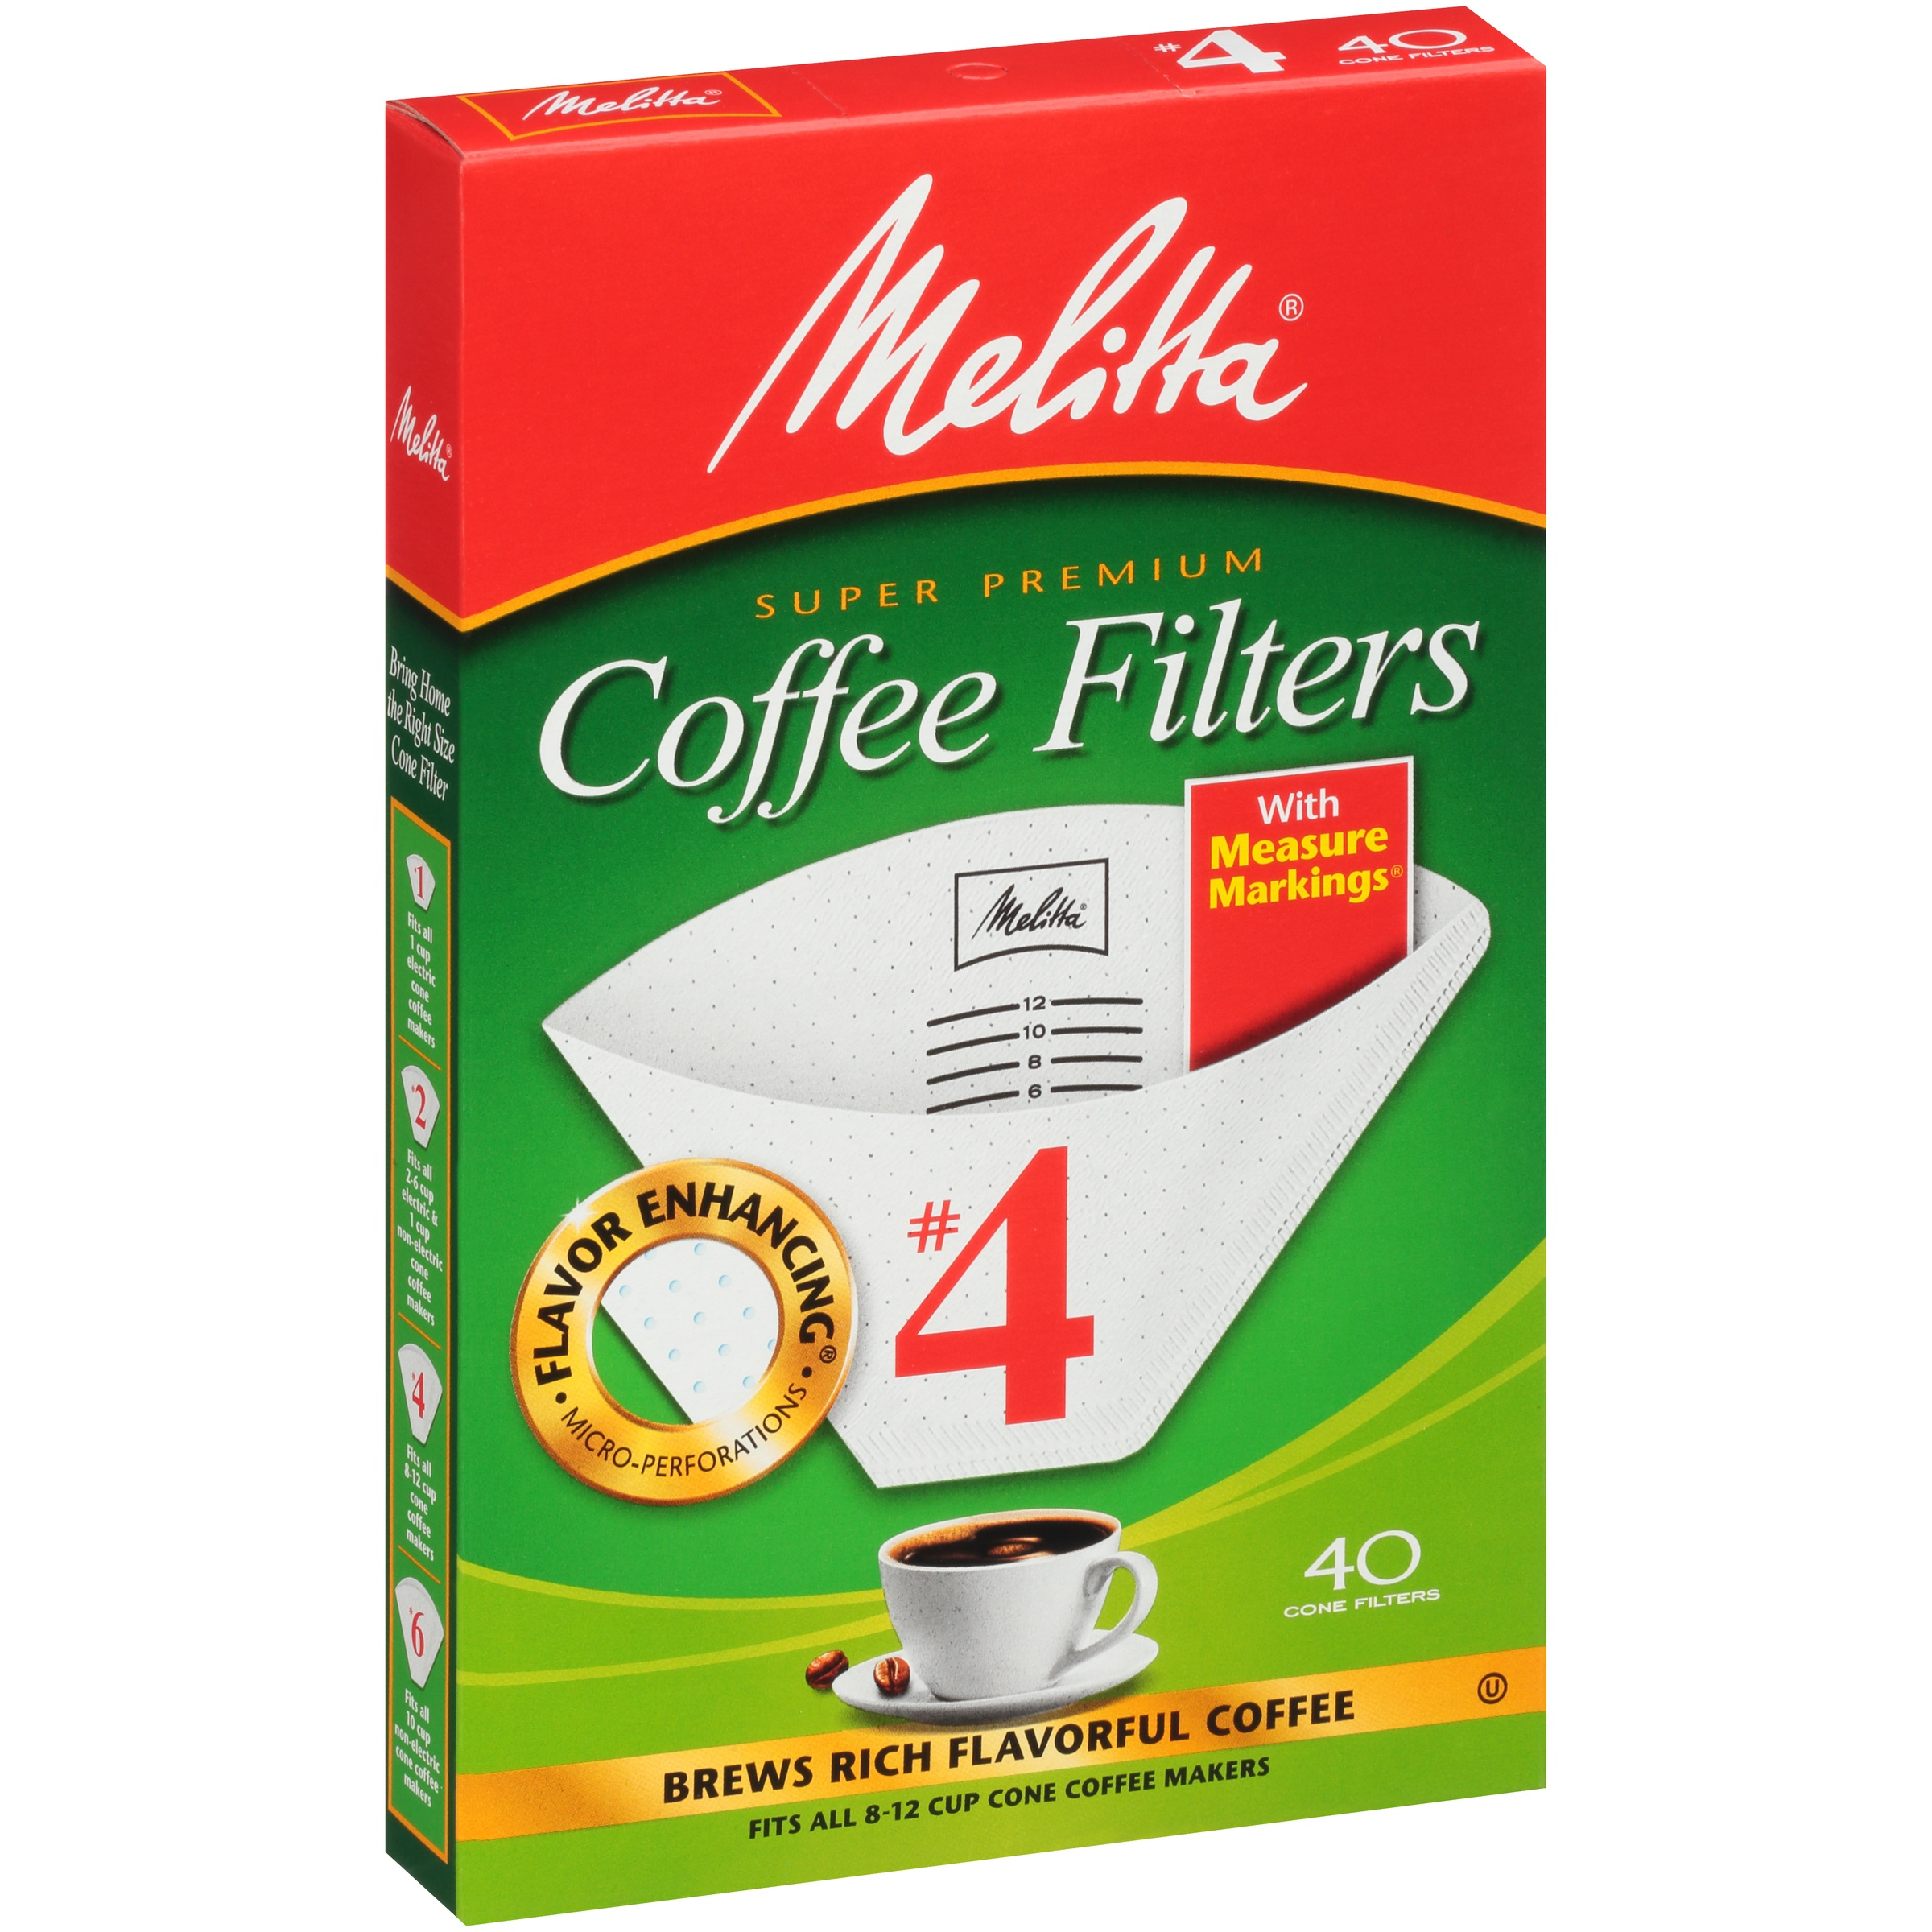 Melitta #4 White Cone Coffee Filters, 40 Count